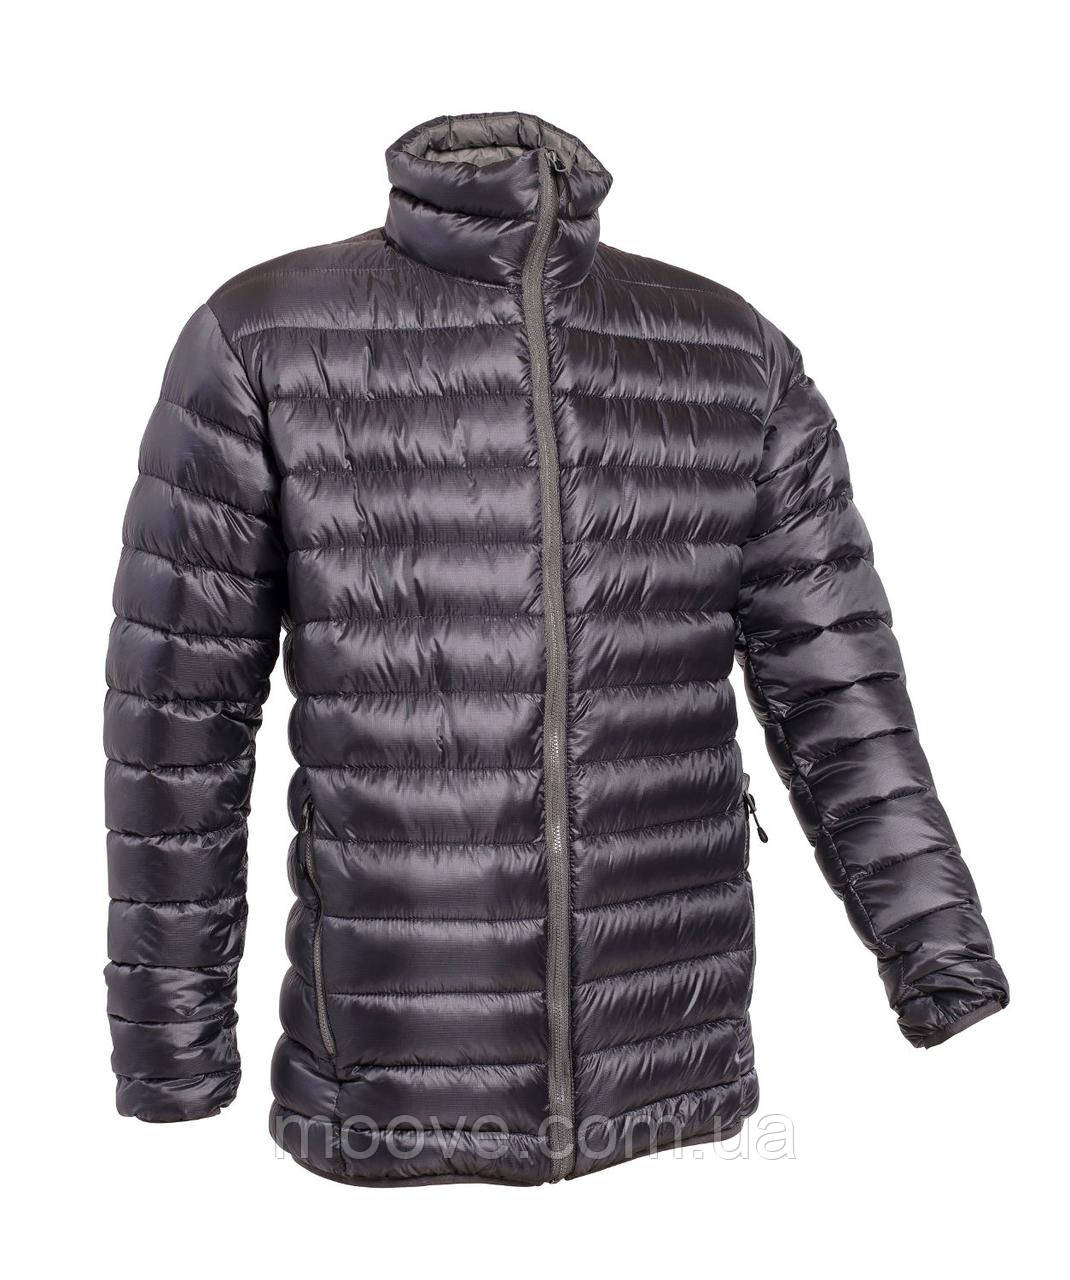 Куртка пуховая Turbat Kostrych